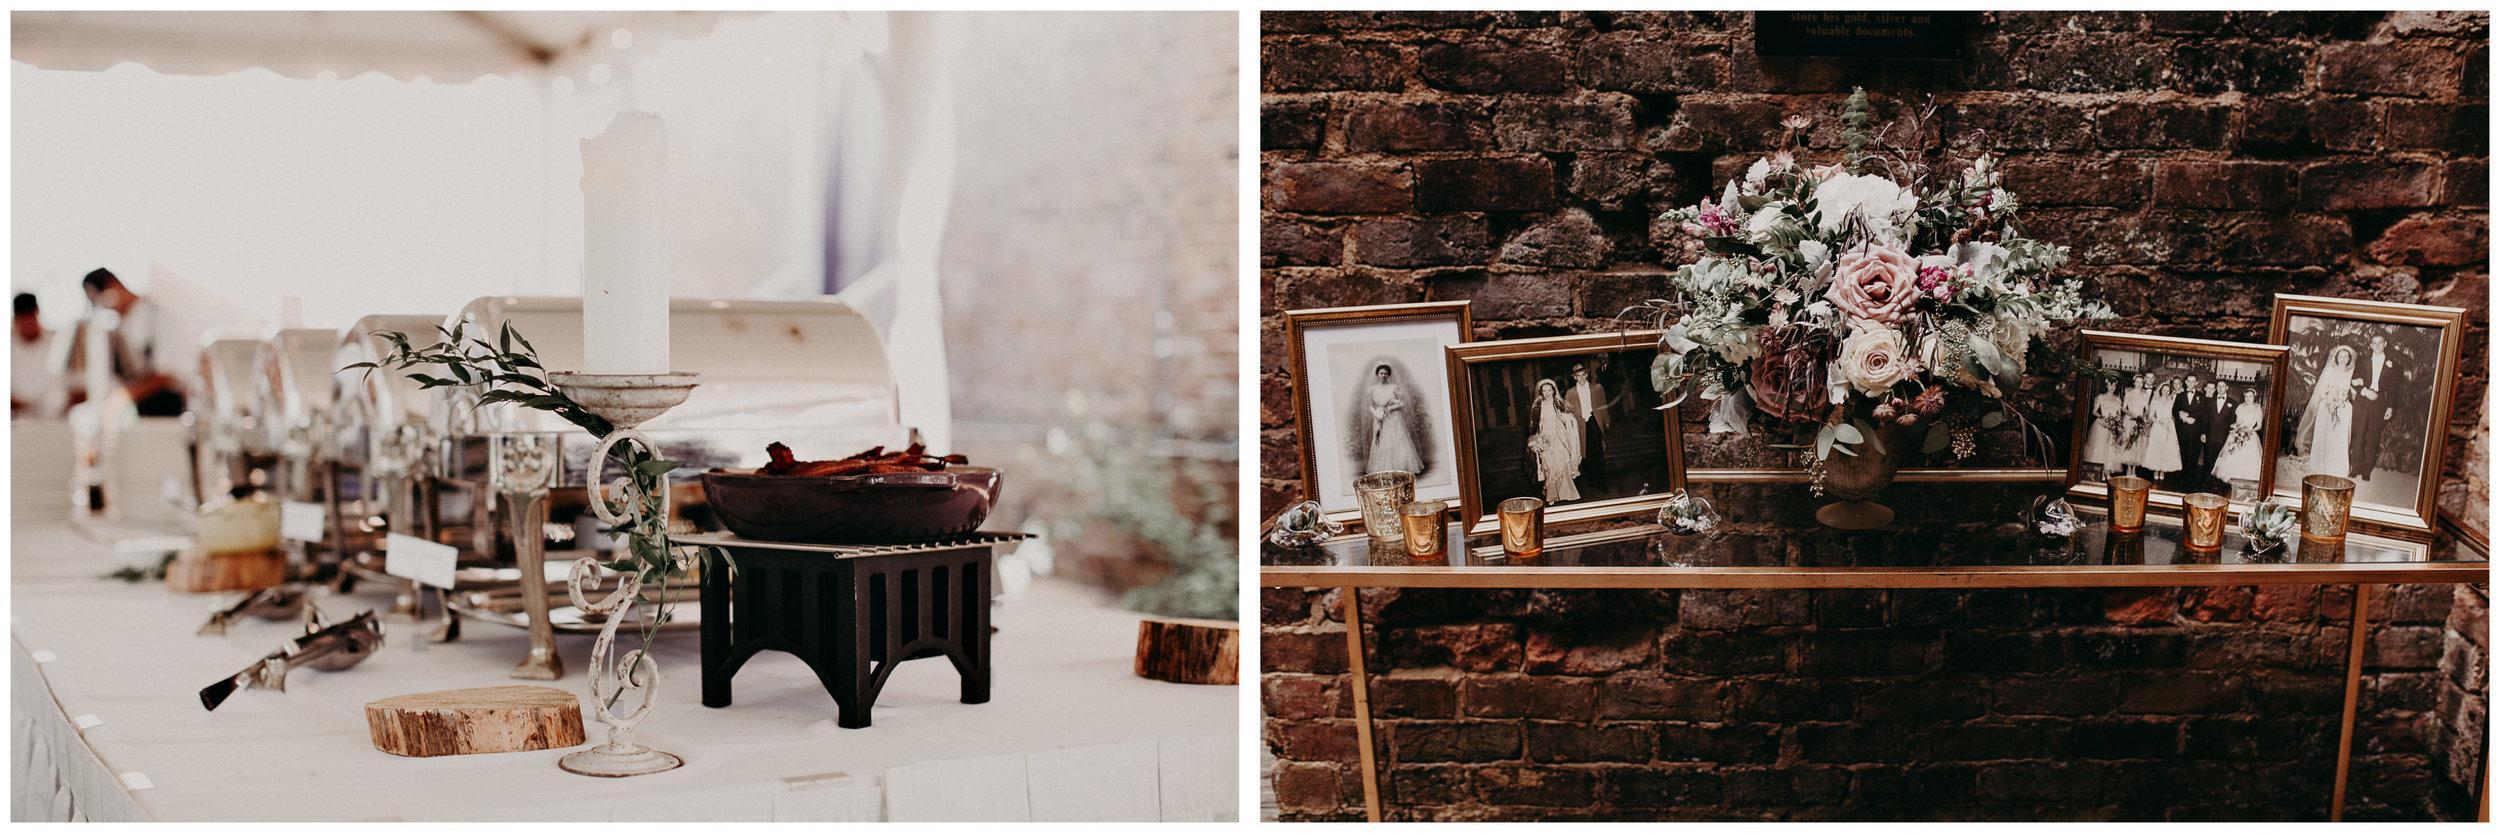 110 - Barnsley Gardens Wedding -Bride and groom portraits - Atlanta wedding photographer .jpg